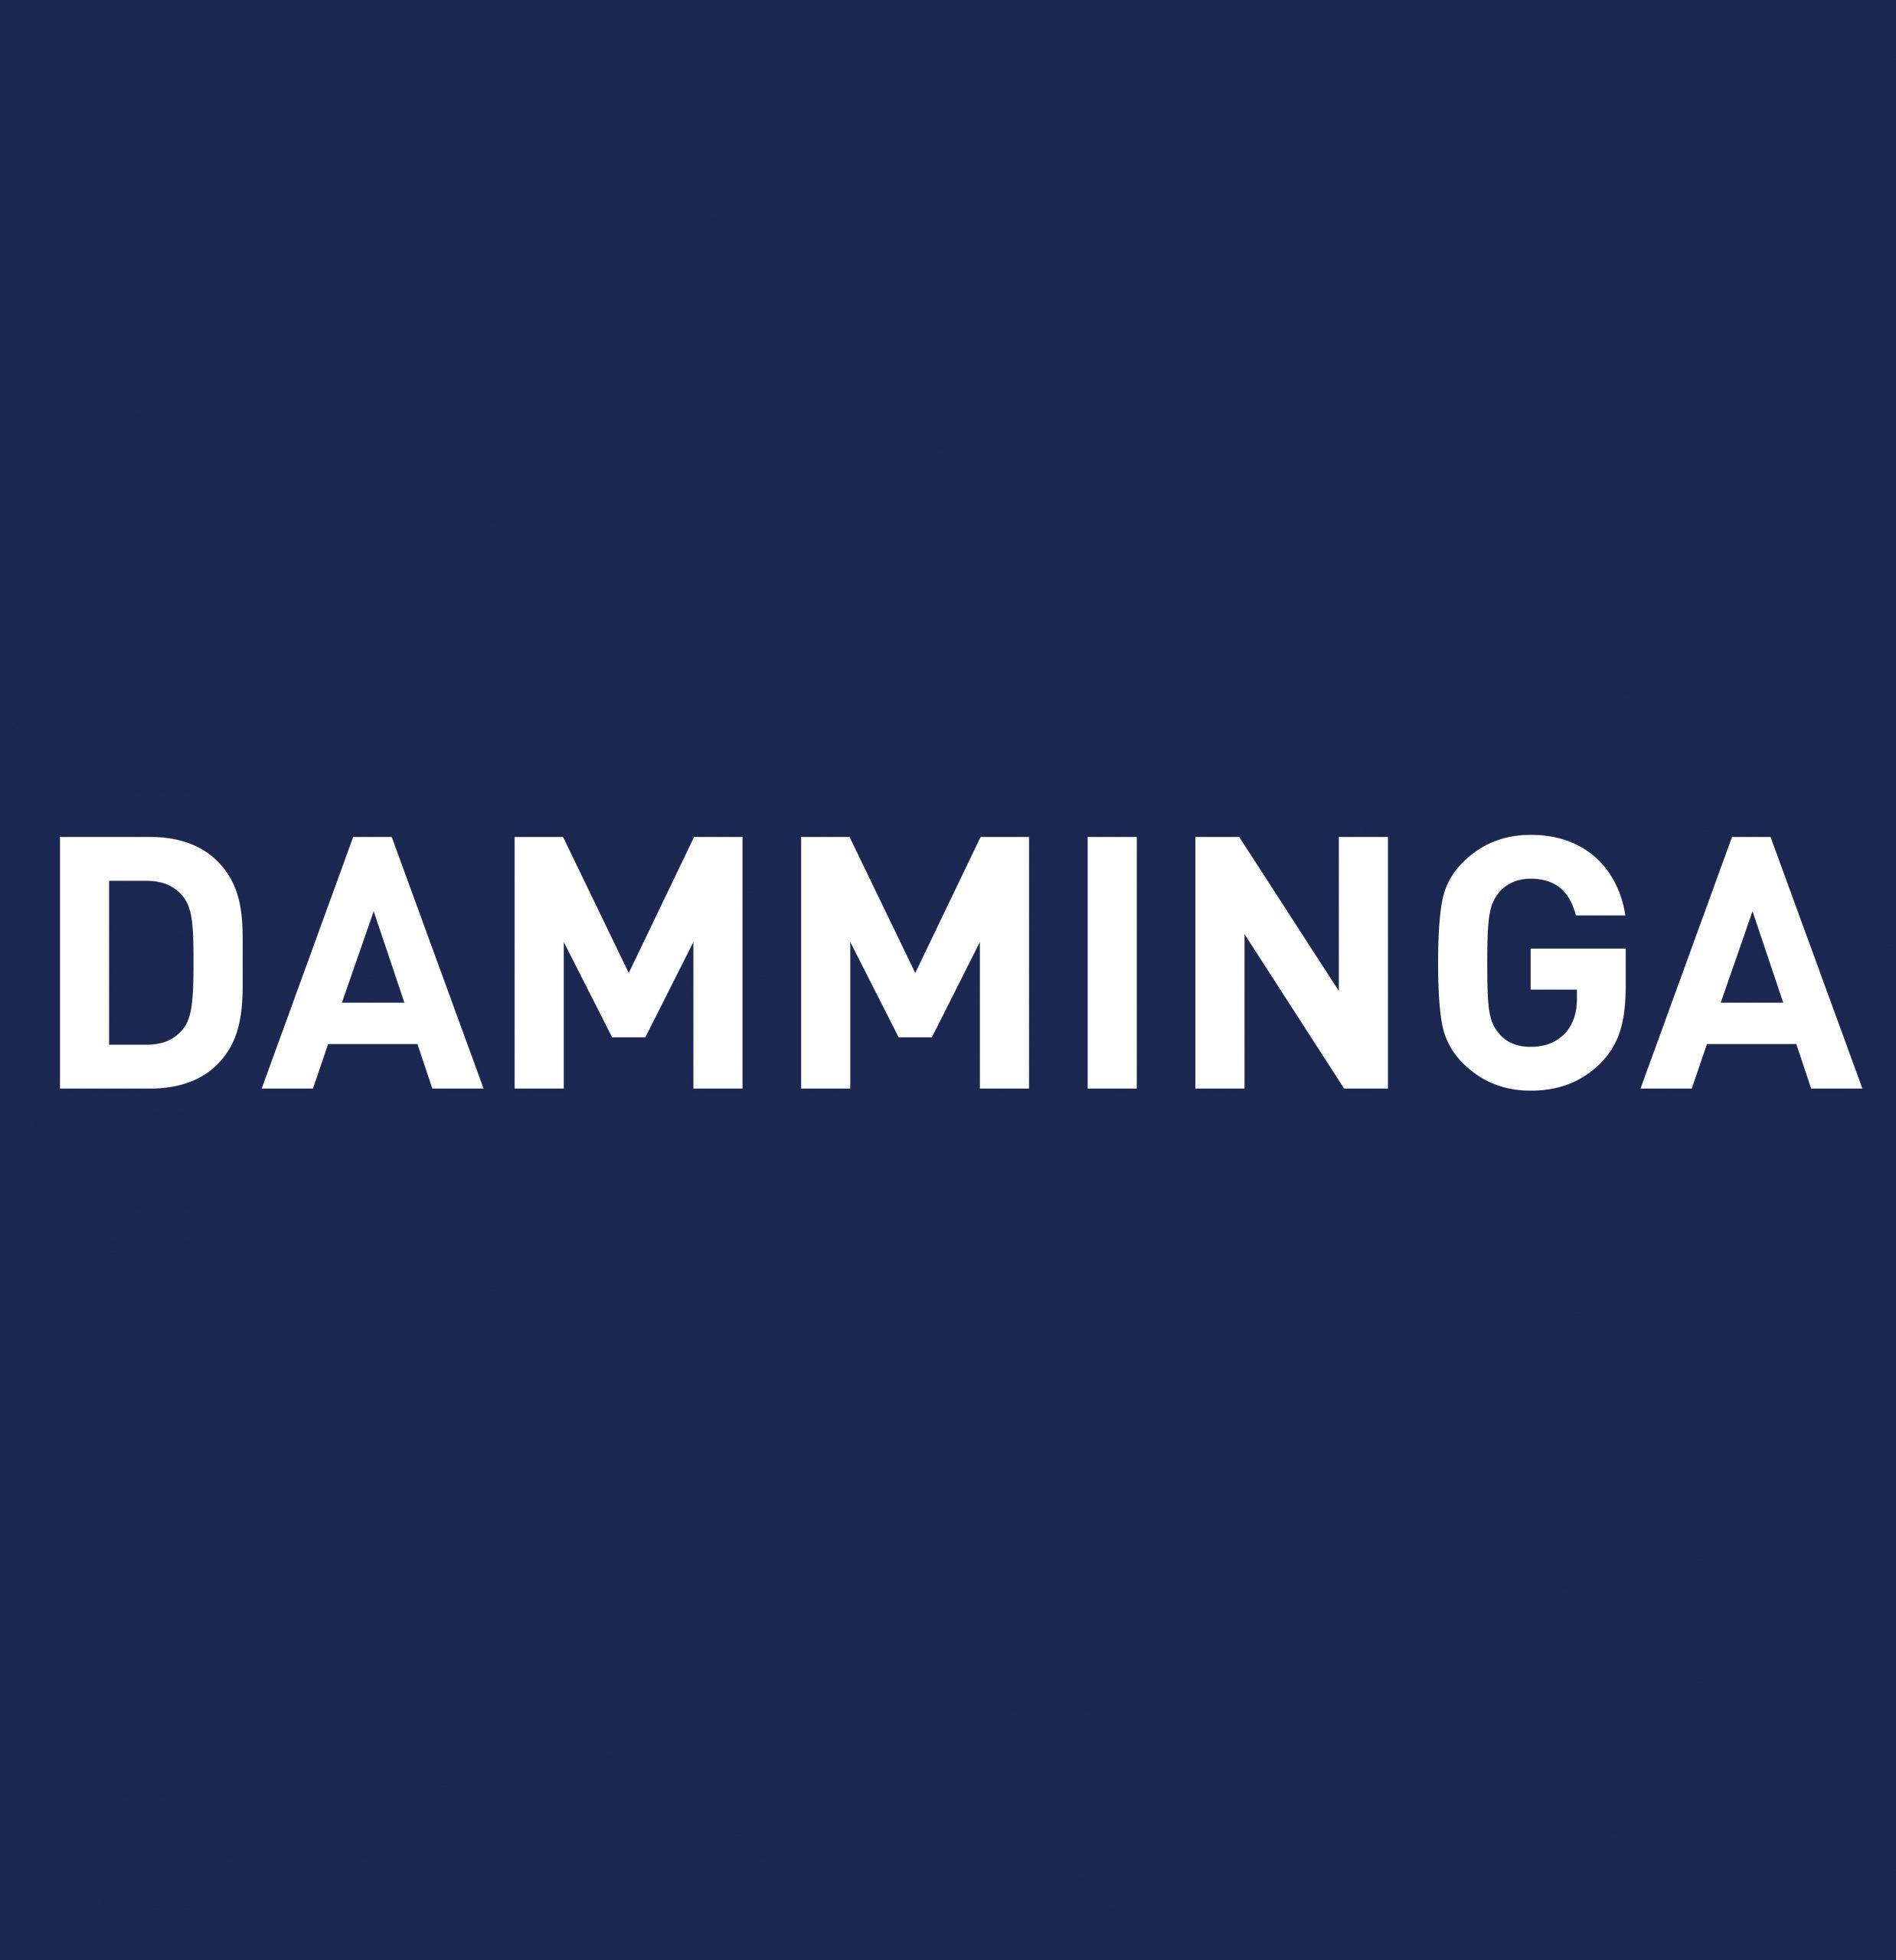 damminga logo